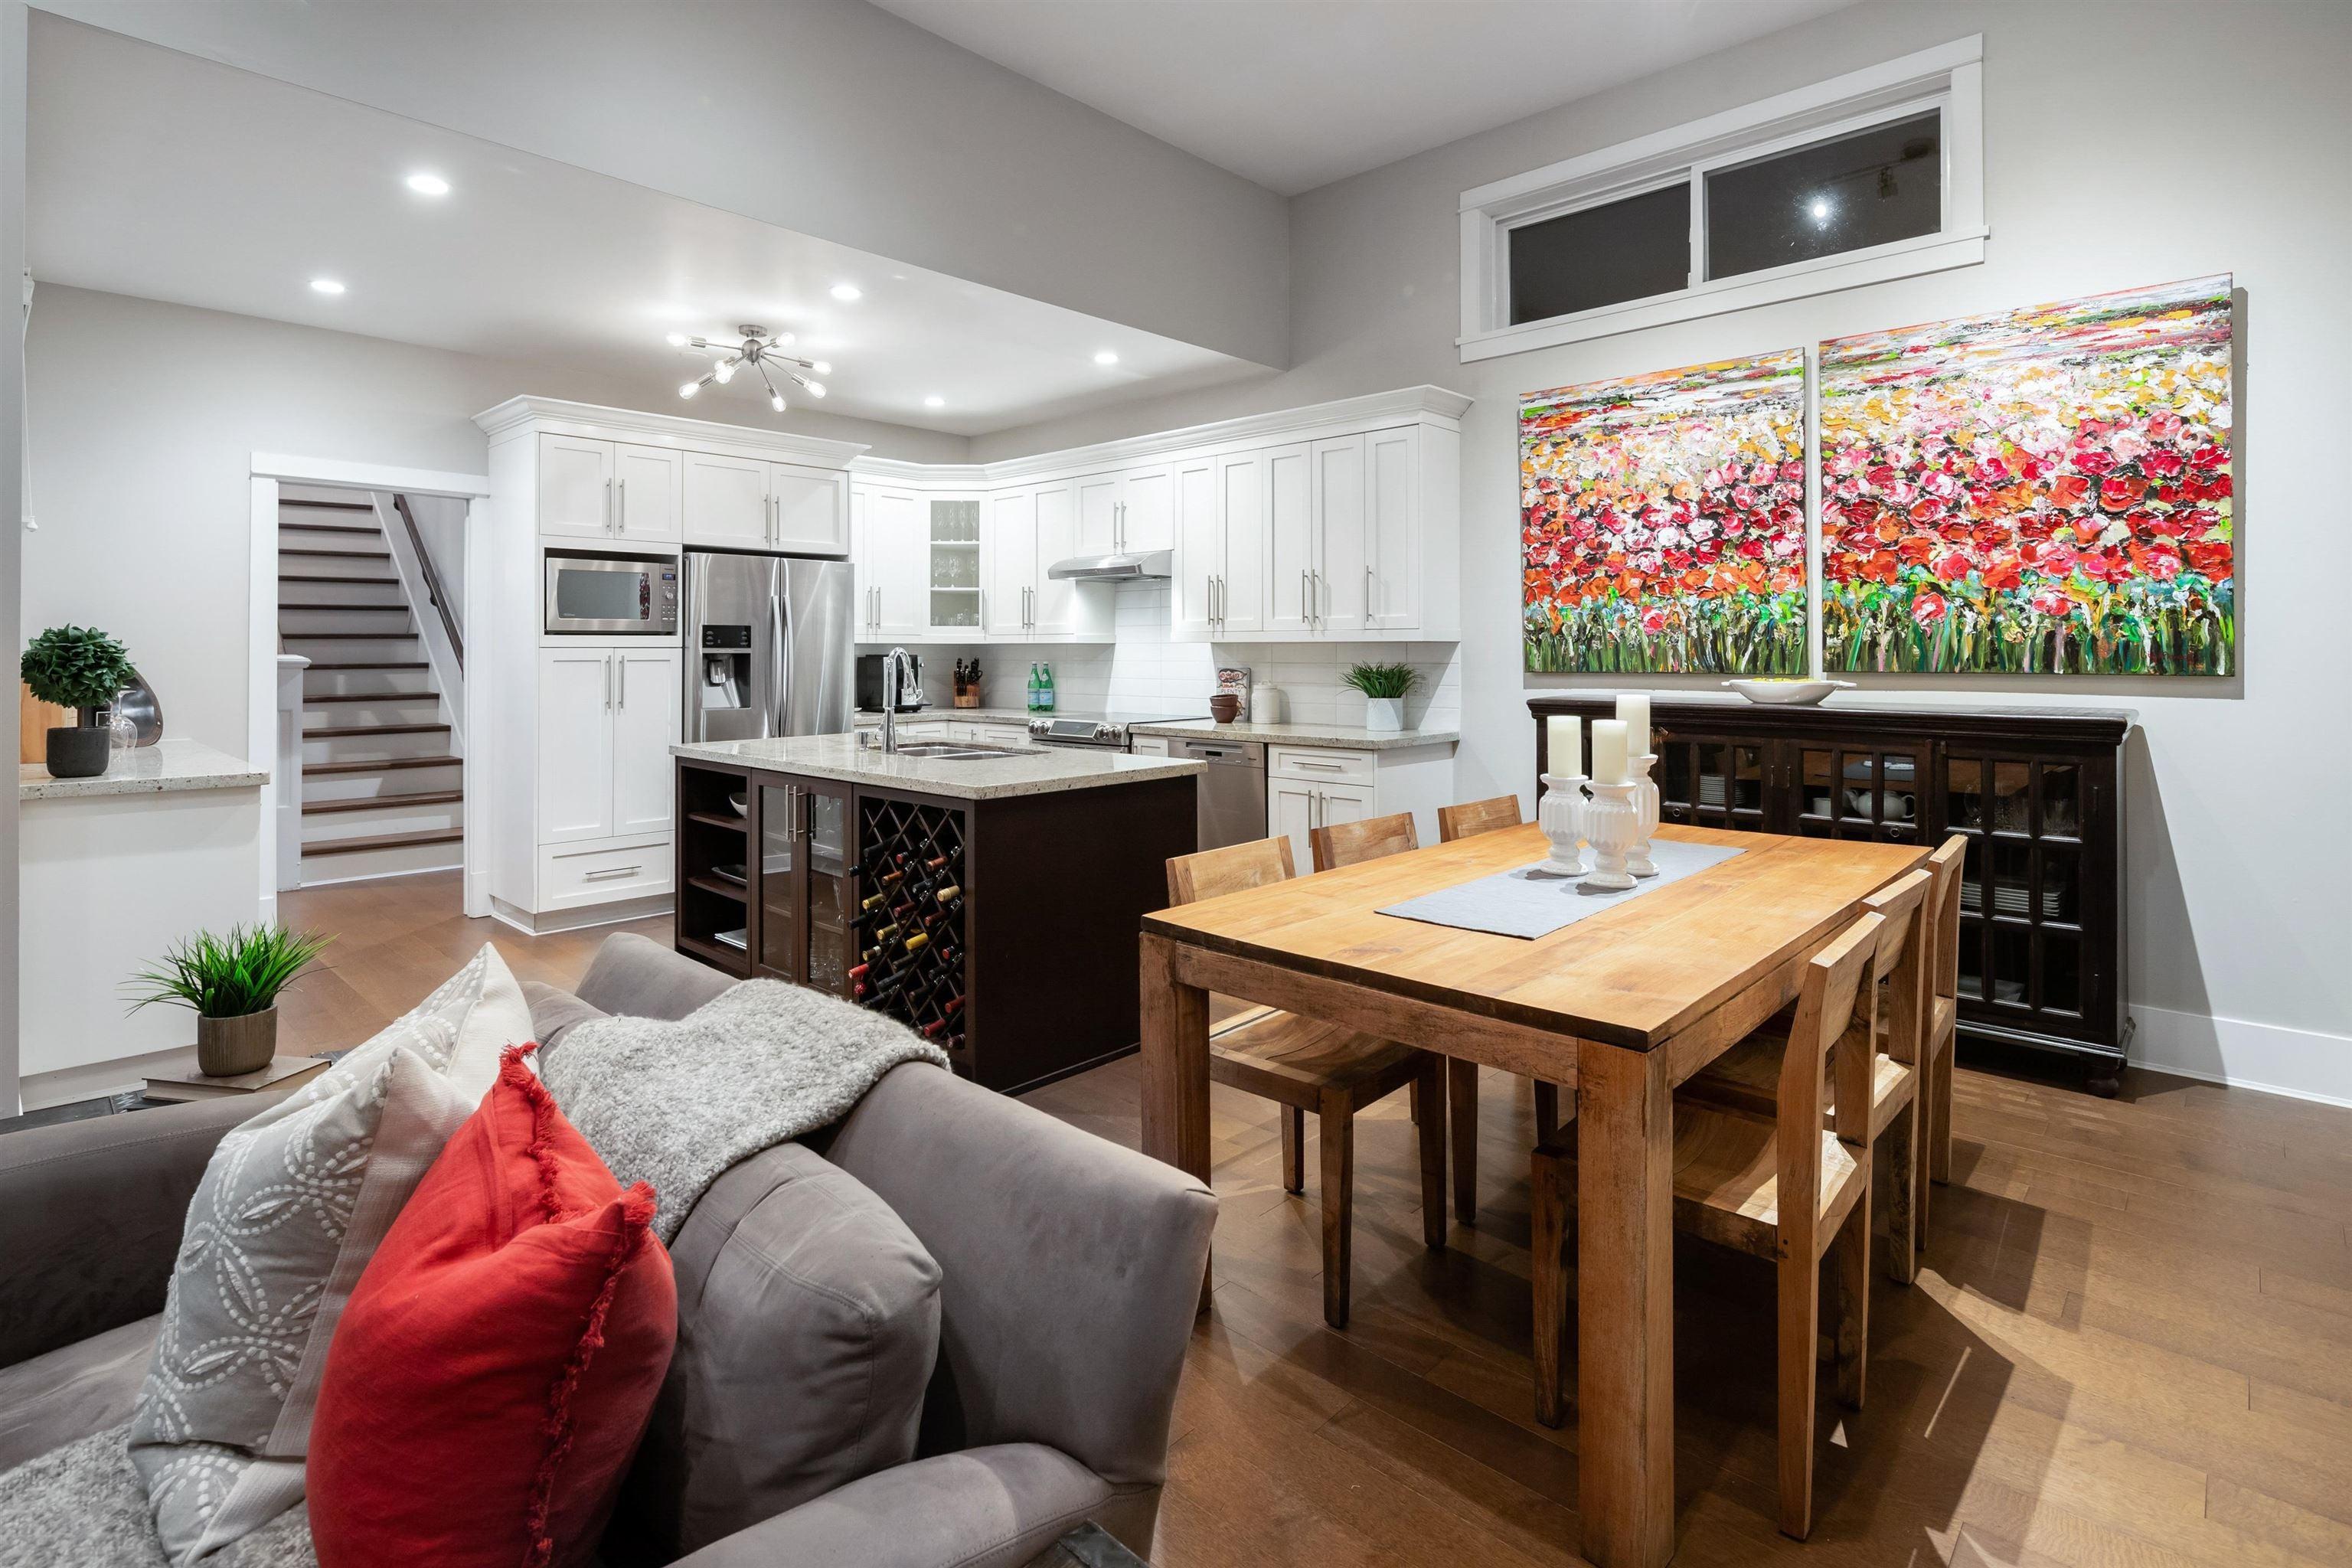 2258 WINDRIDGE DRIVE - Seymour NV House/Single Family for sale, 5 Bedrooms (R2617156) - #10